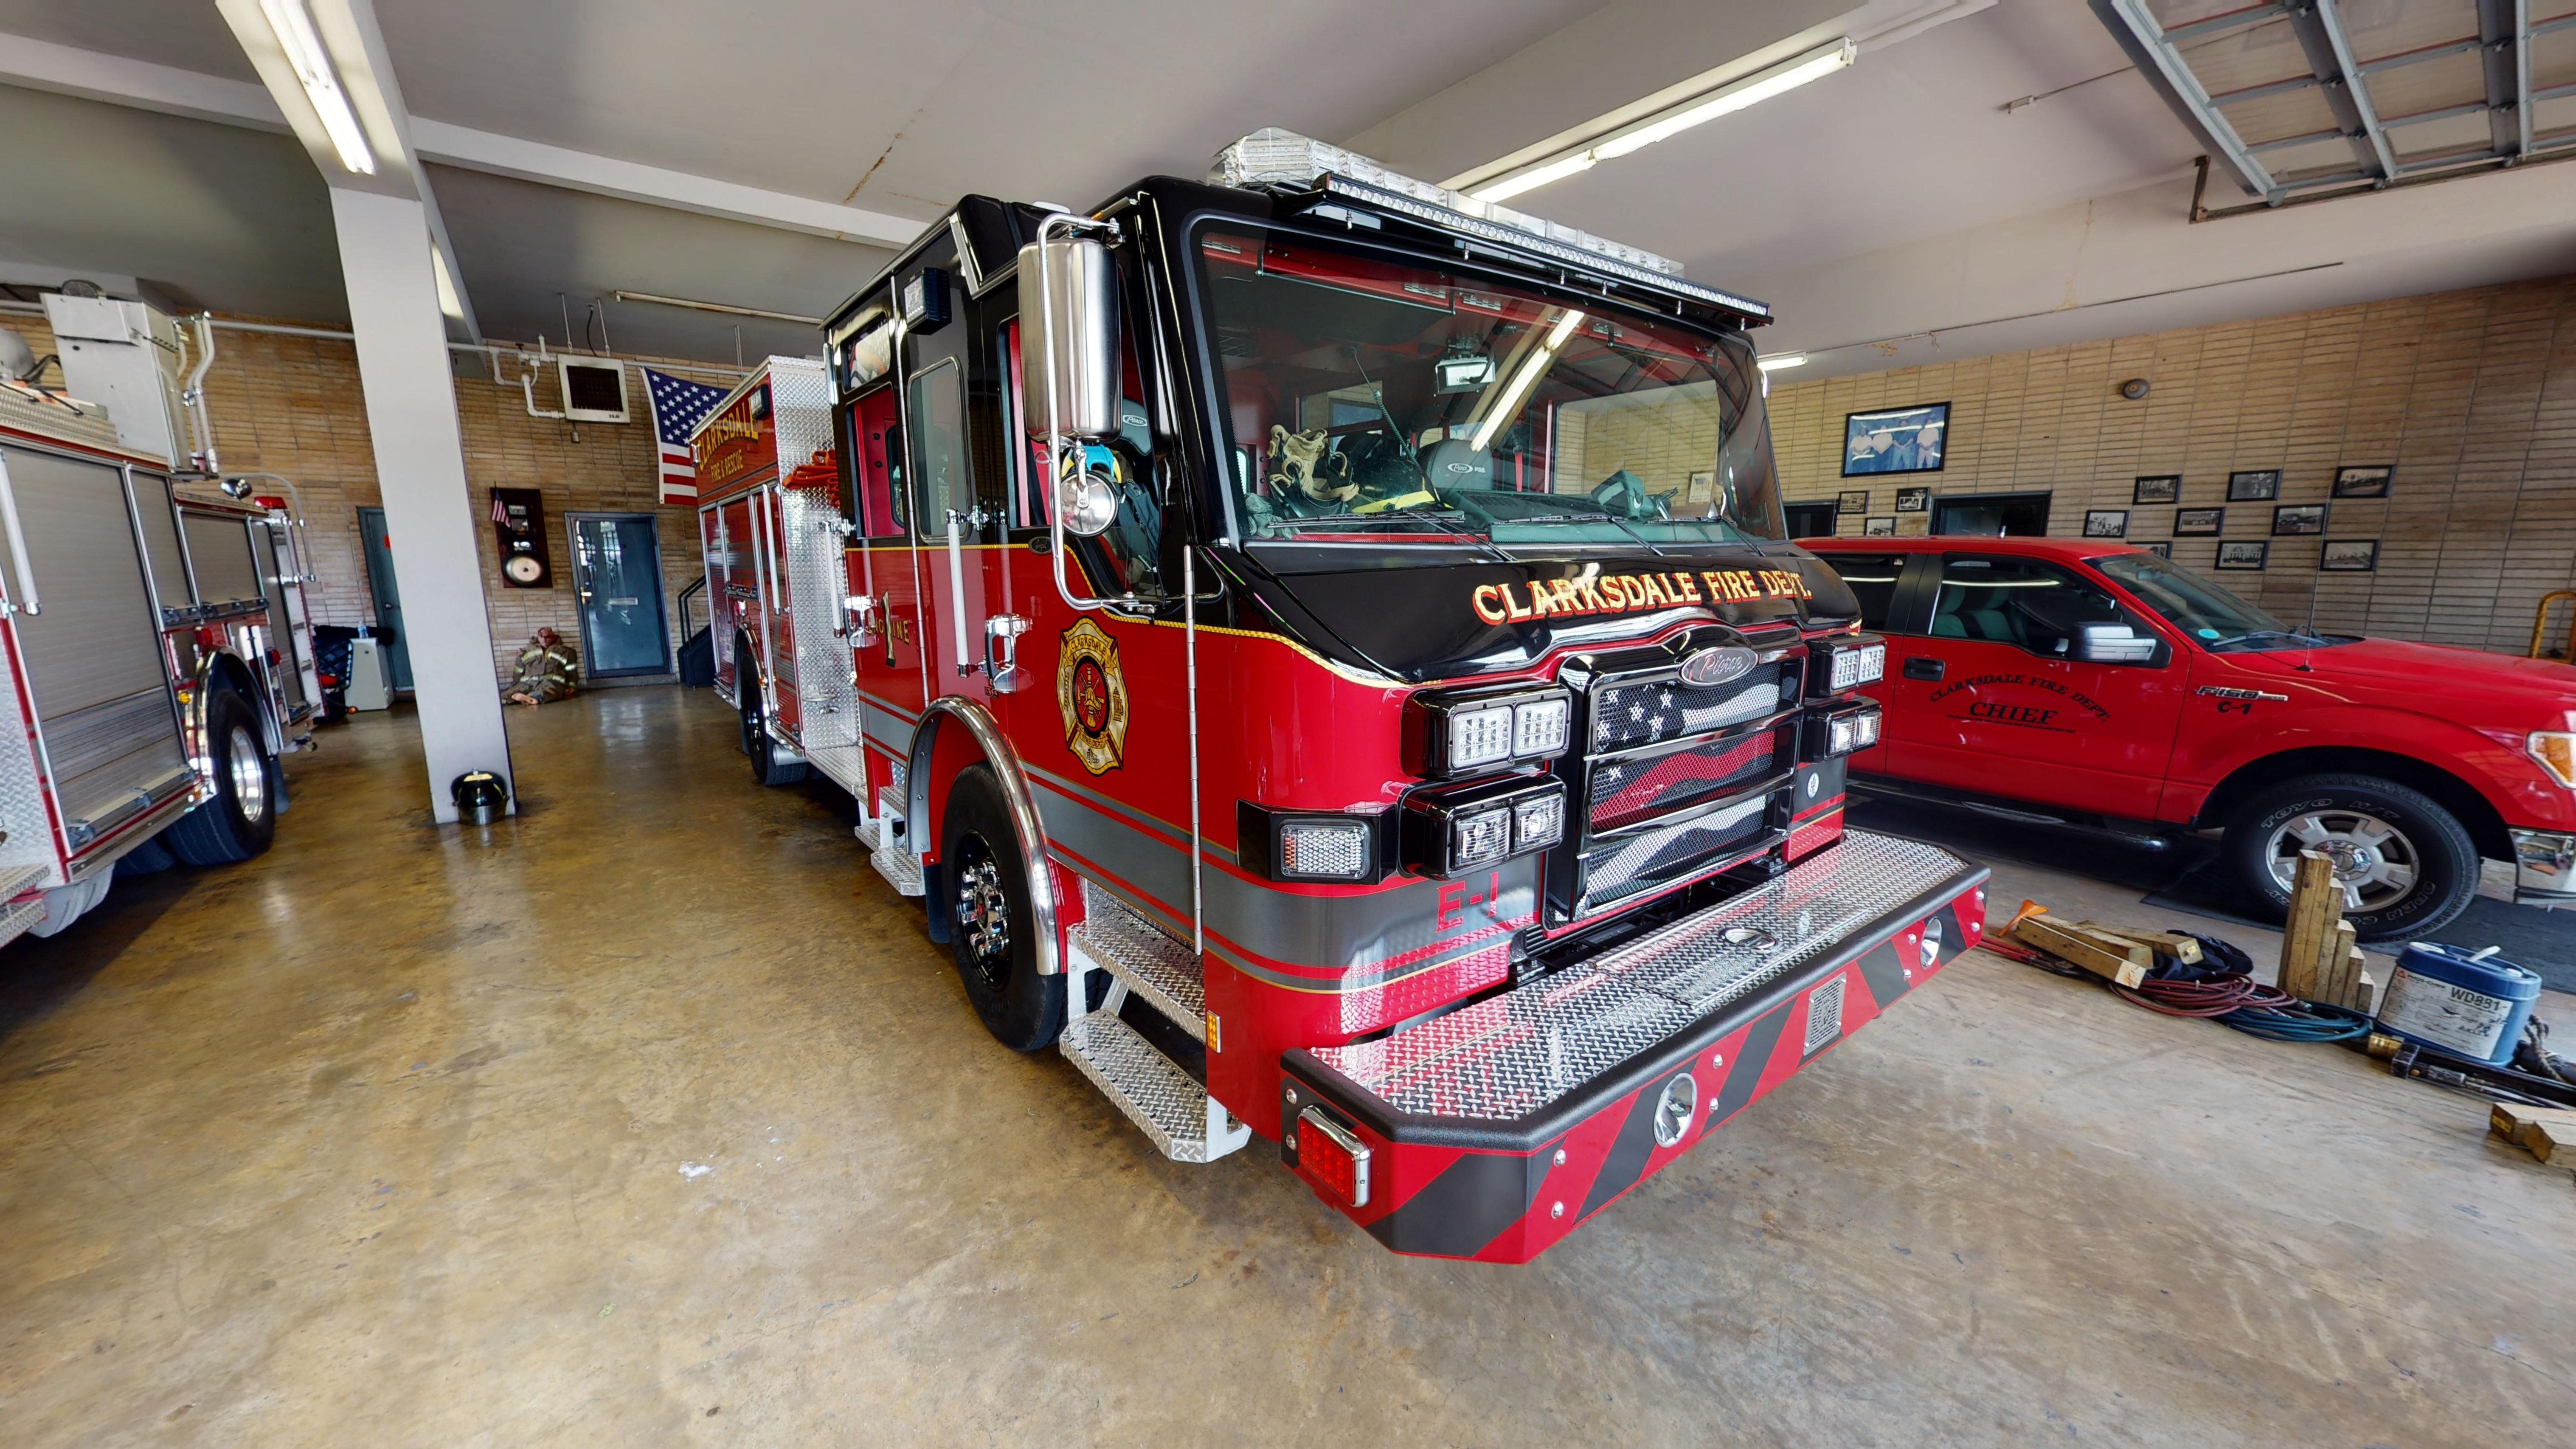 Clarksdale-Fire-Dept-06072021_133615